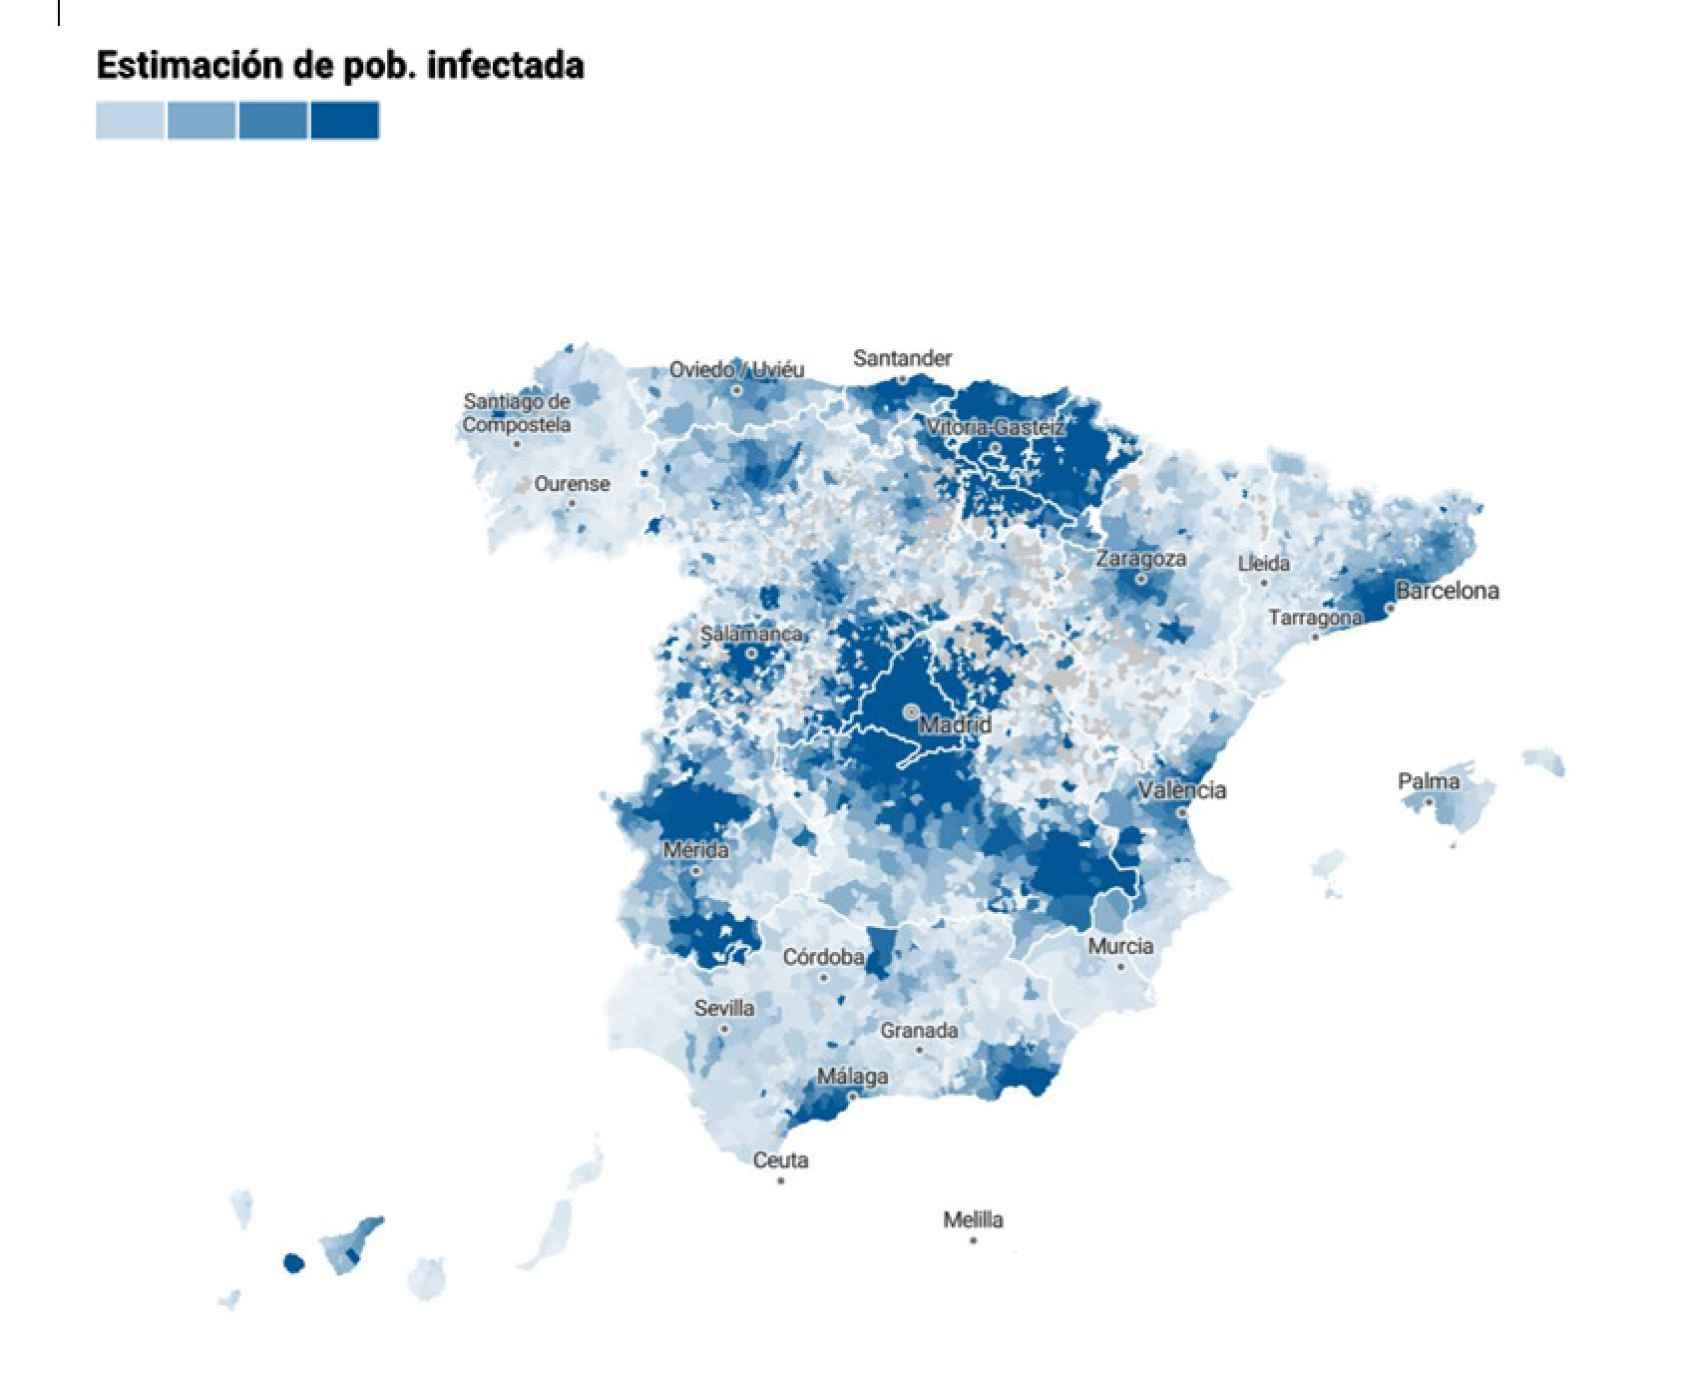 Fuente: Universitat Rovira i Virgili (URV) y Universidad de Zaragoza (UZ) –Diario .es